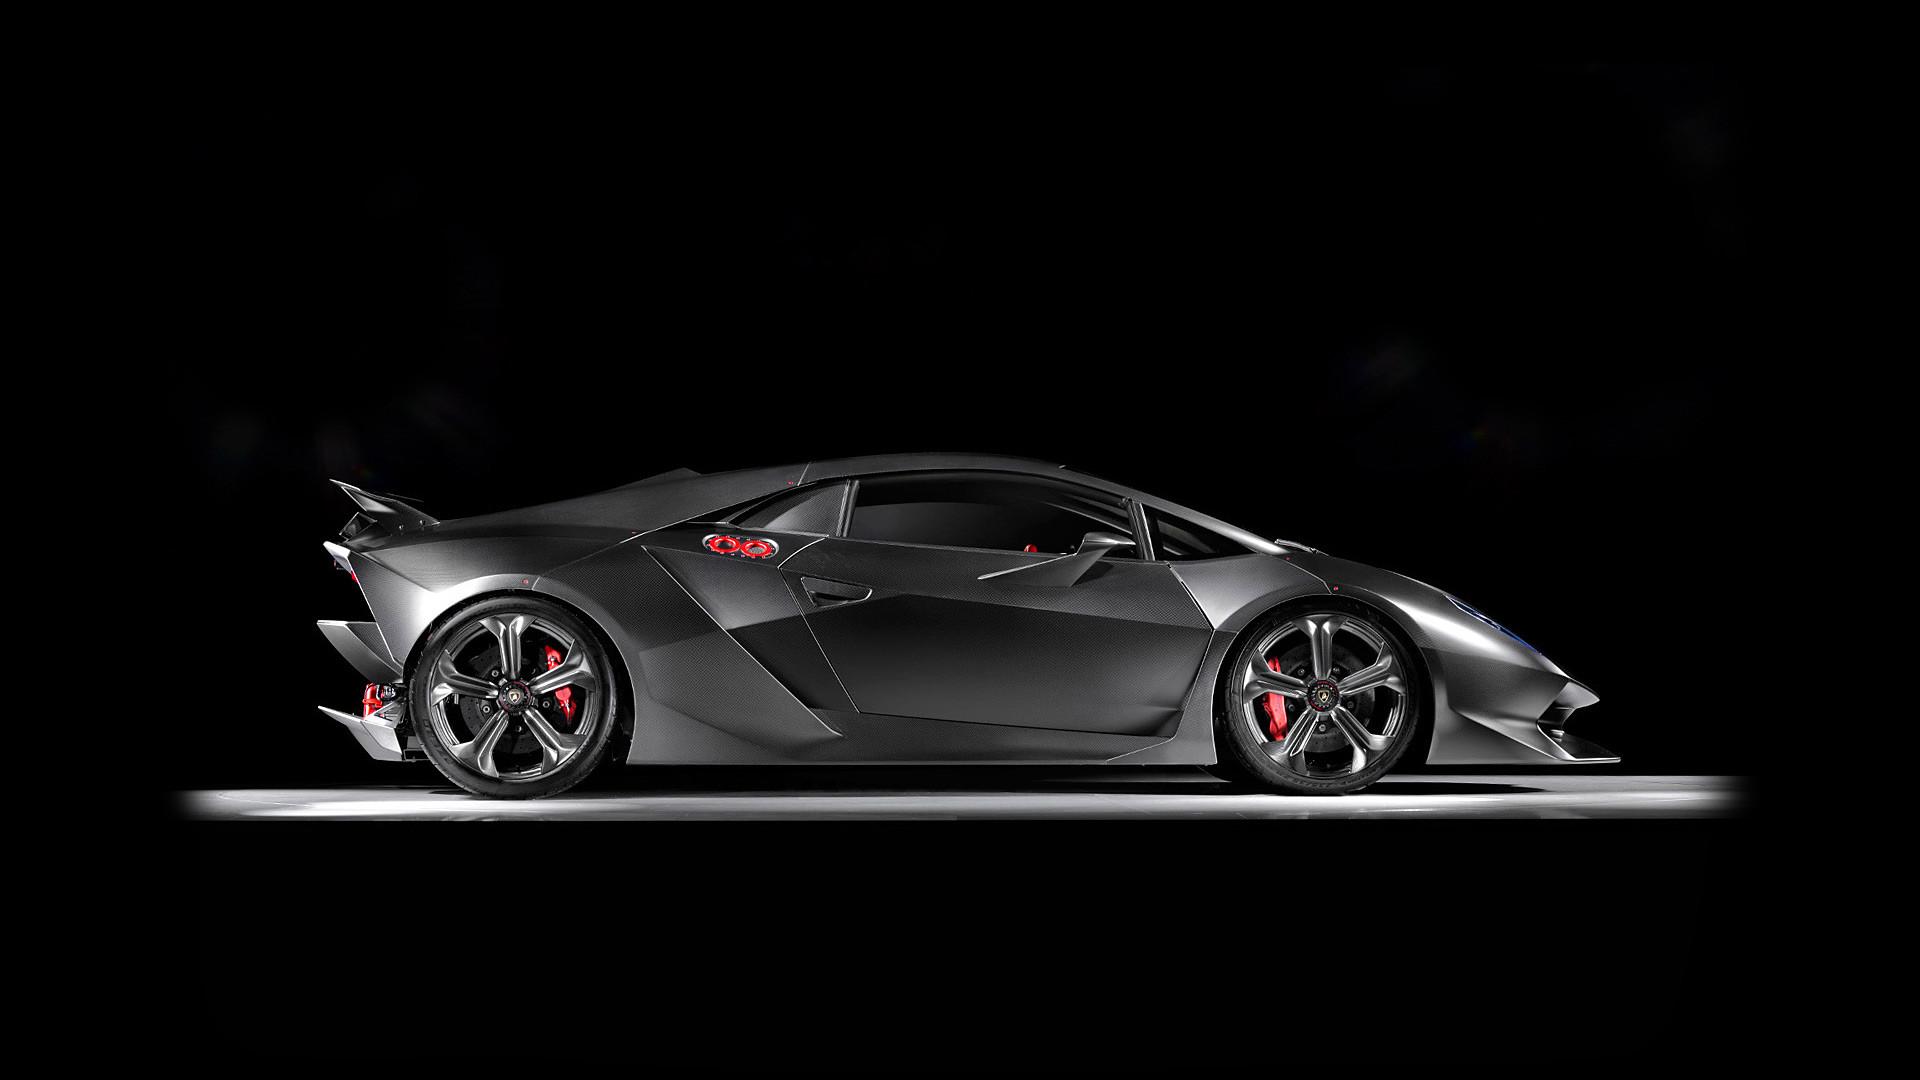 1920x1080 Black Lamborghini Sesto Elemento 1920x1080. 1920x1080 · 27 ·  Download · 2015 Lamborghini ...